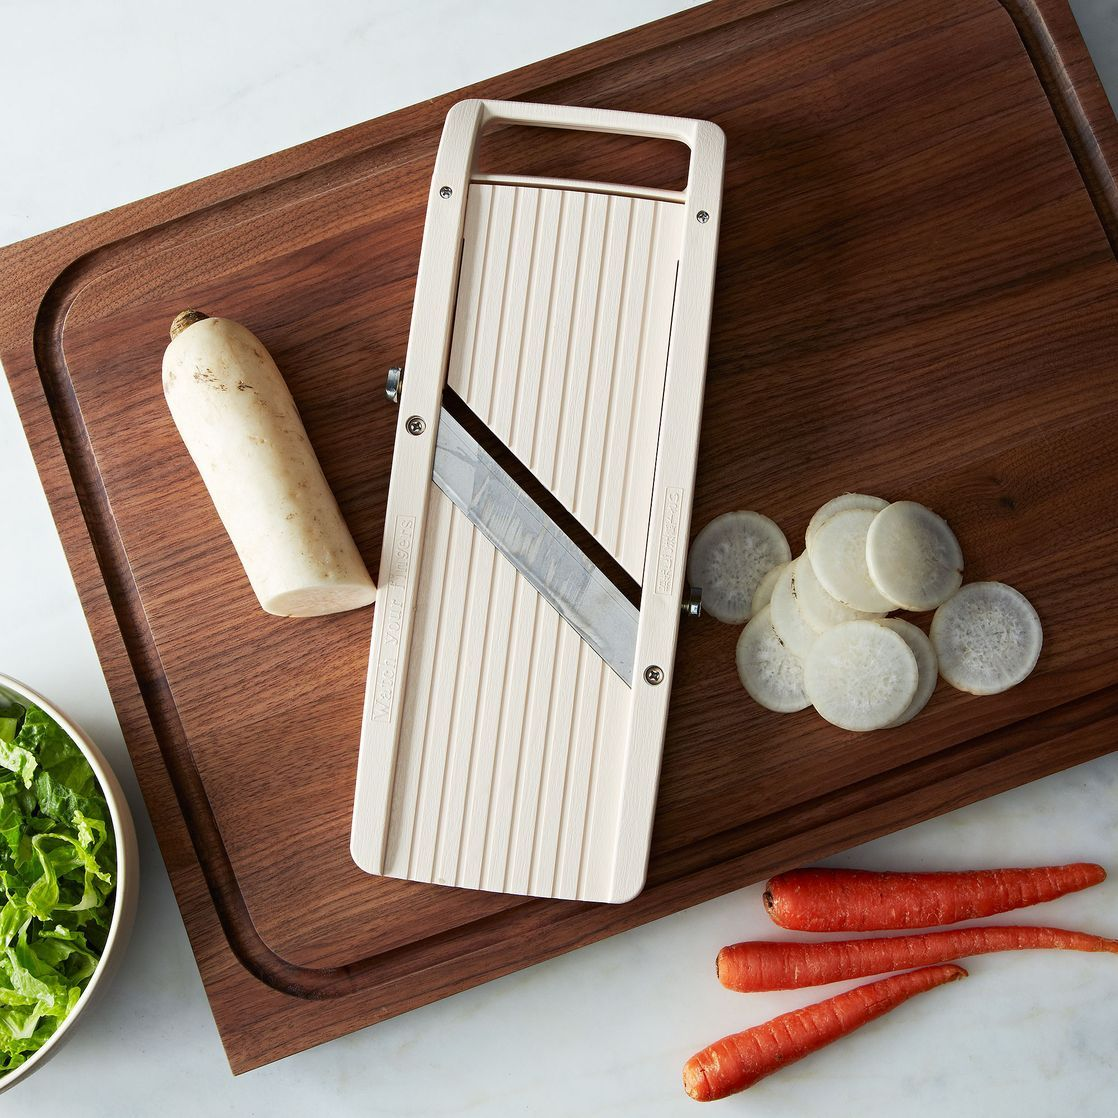 Super Benriner Mandoline Cooking Gadgets How To Cook Pasta Food 52